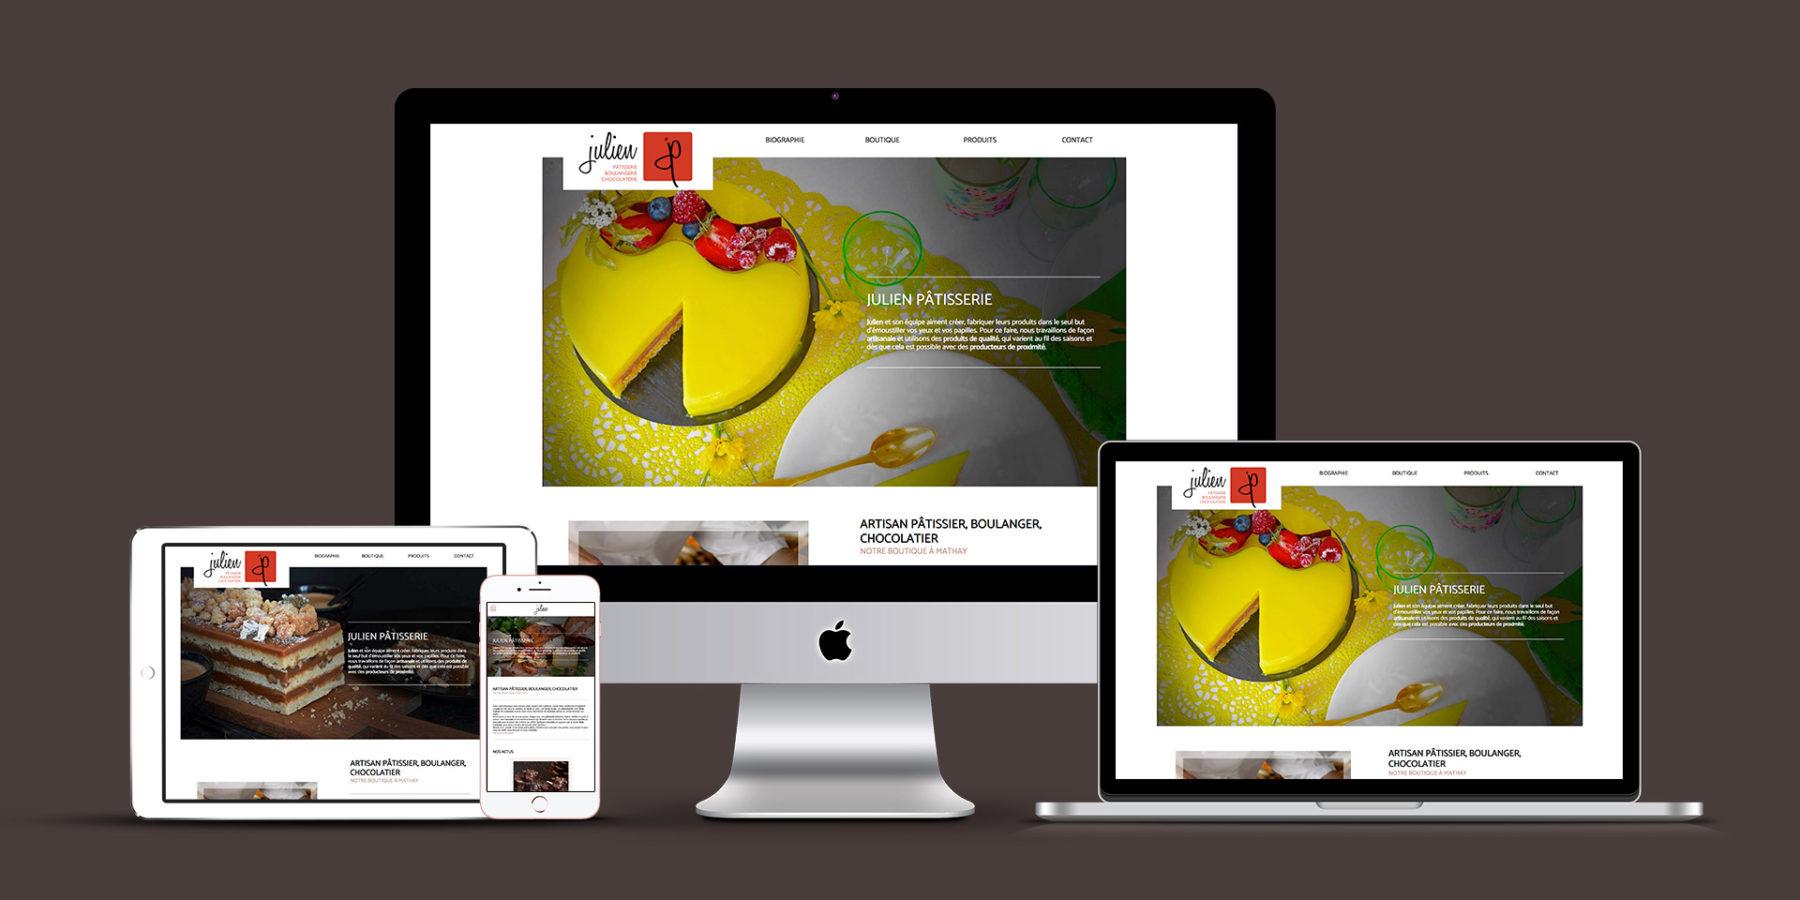 Julien bakery's website on deskyop, laptop, tablet and mobile phone